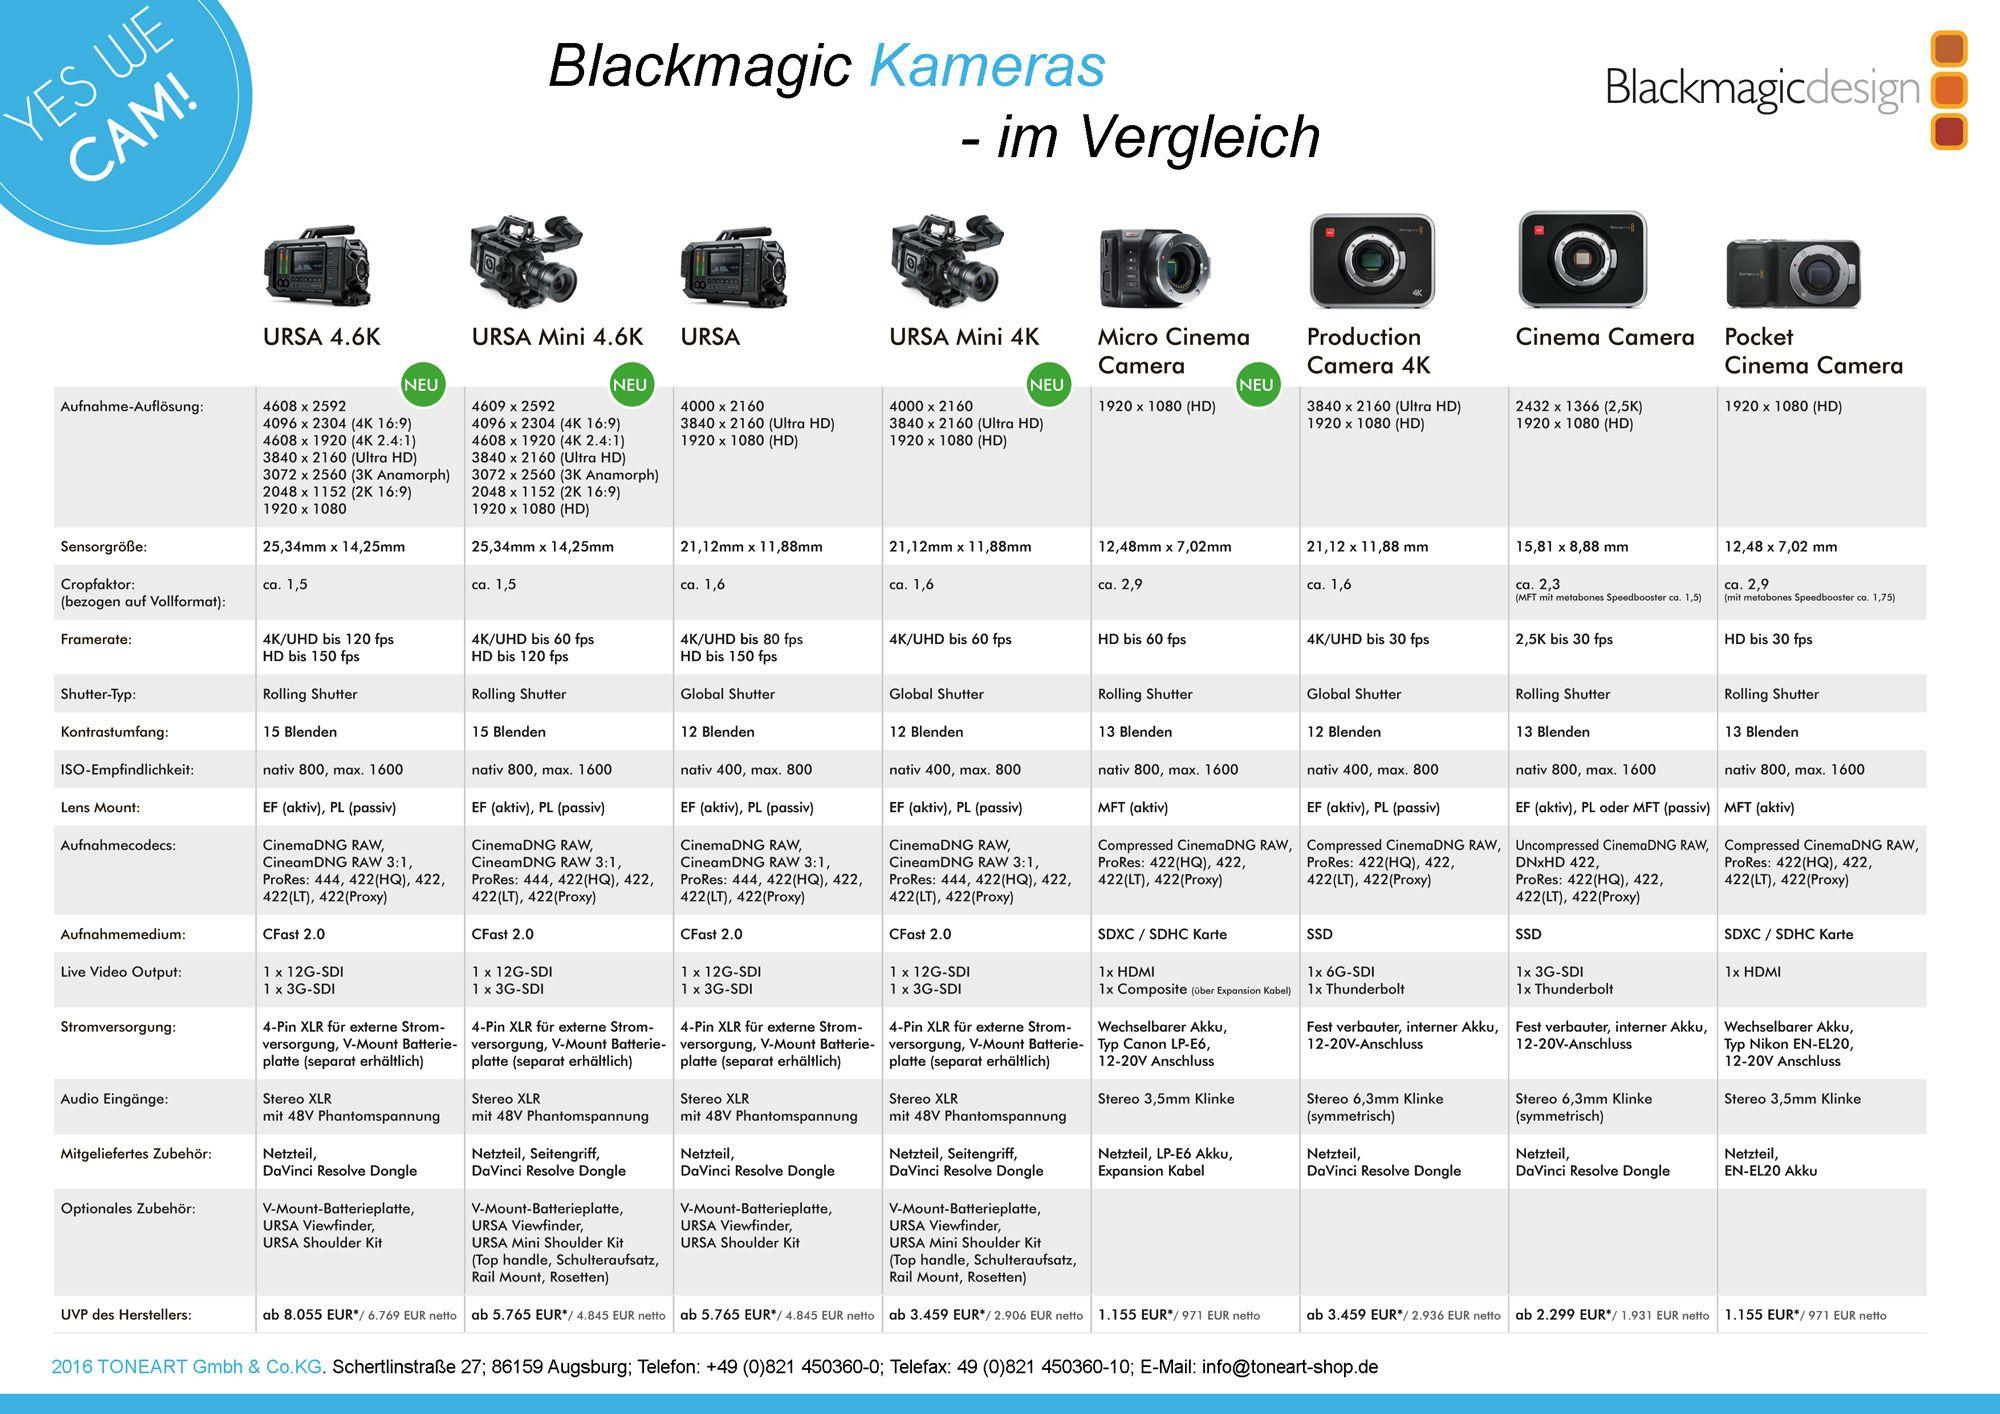 Blackmagic Design Kameravergleich